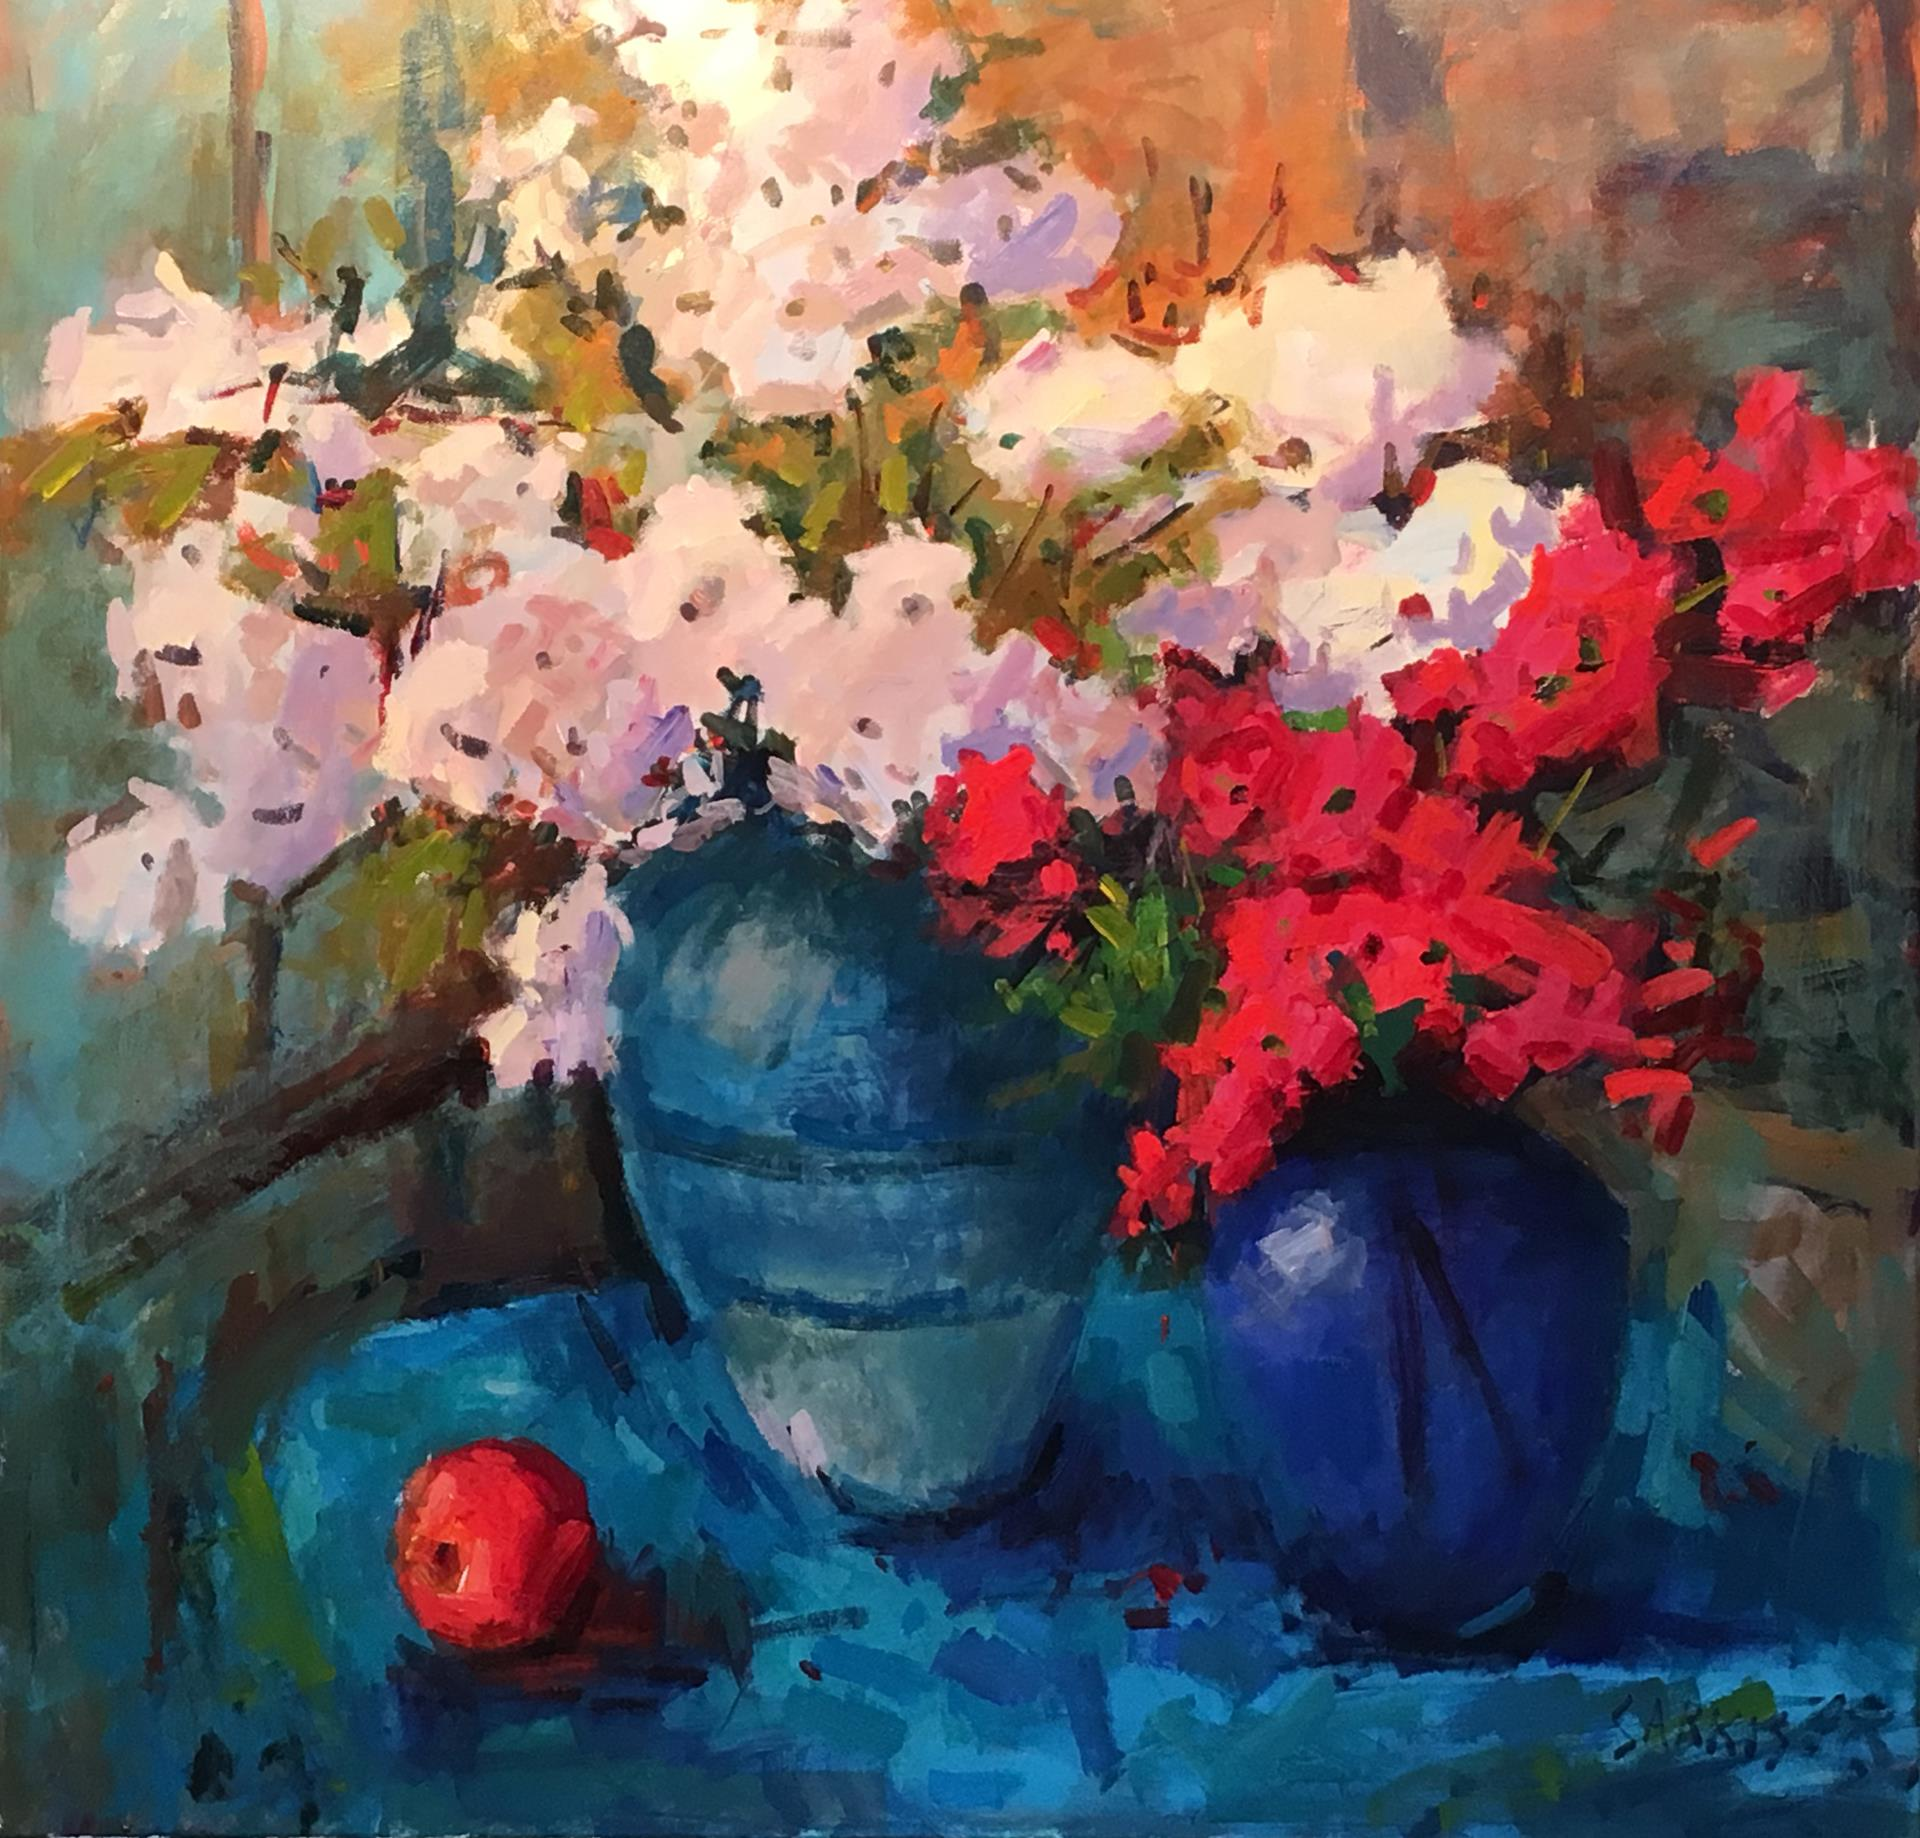 Sarkis Antikajian, Cherry Blossoms and Azaleas